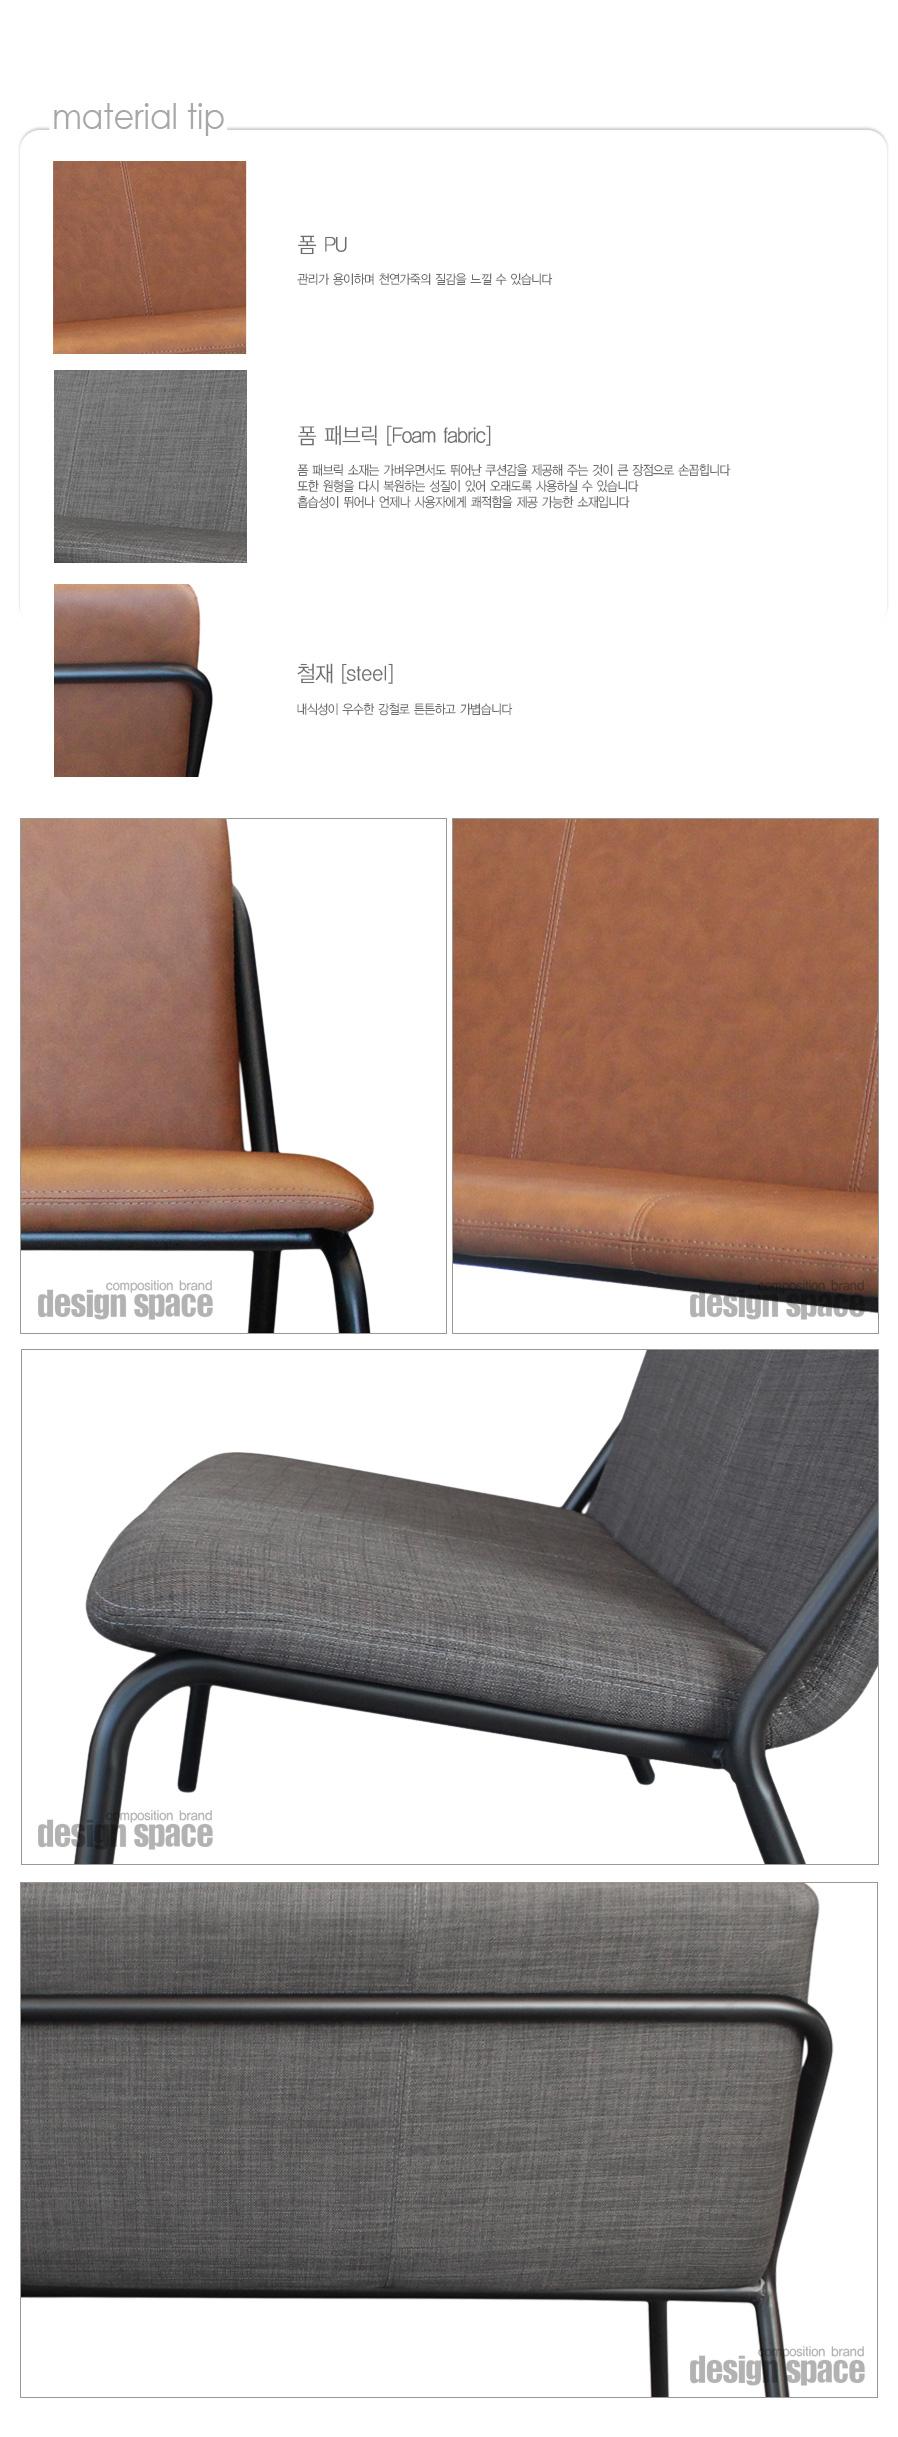 mackenzie-double-chair_04.jpg